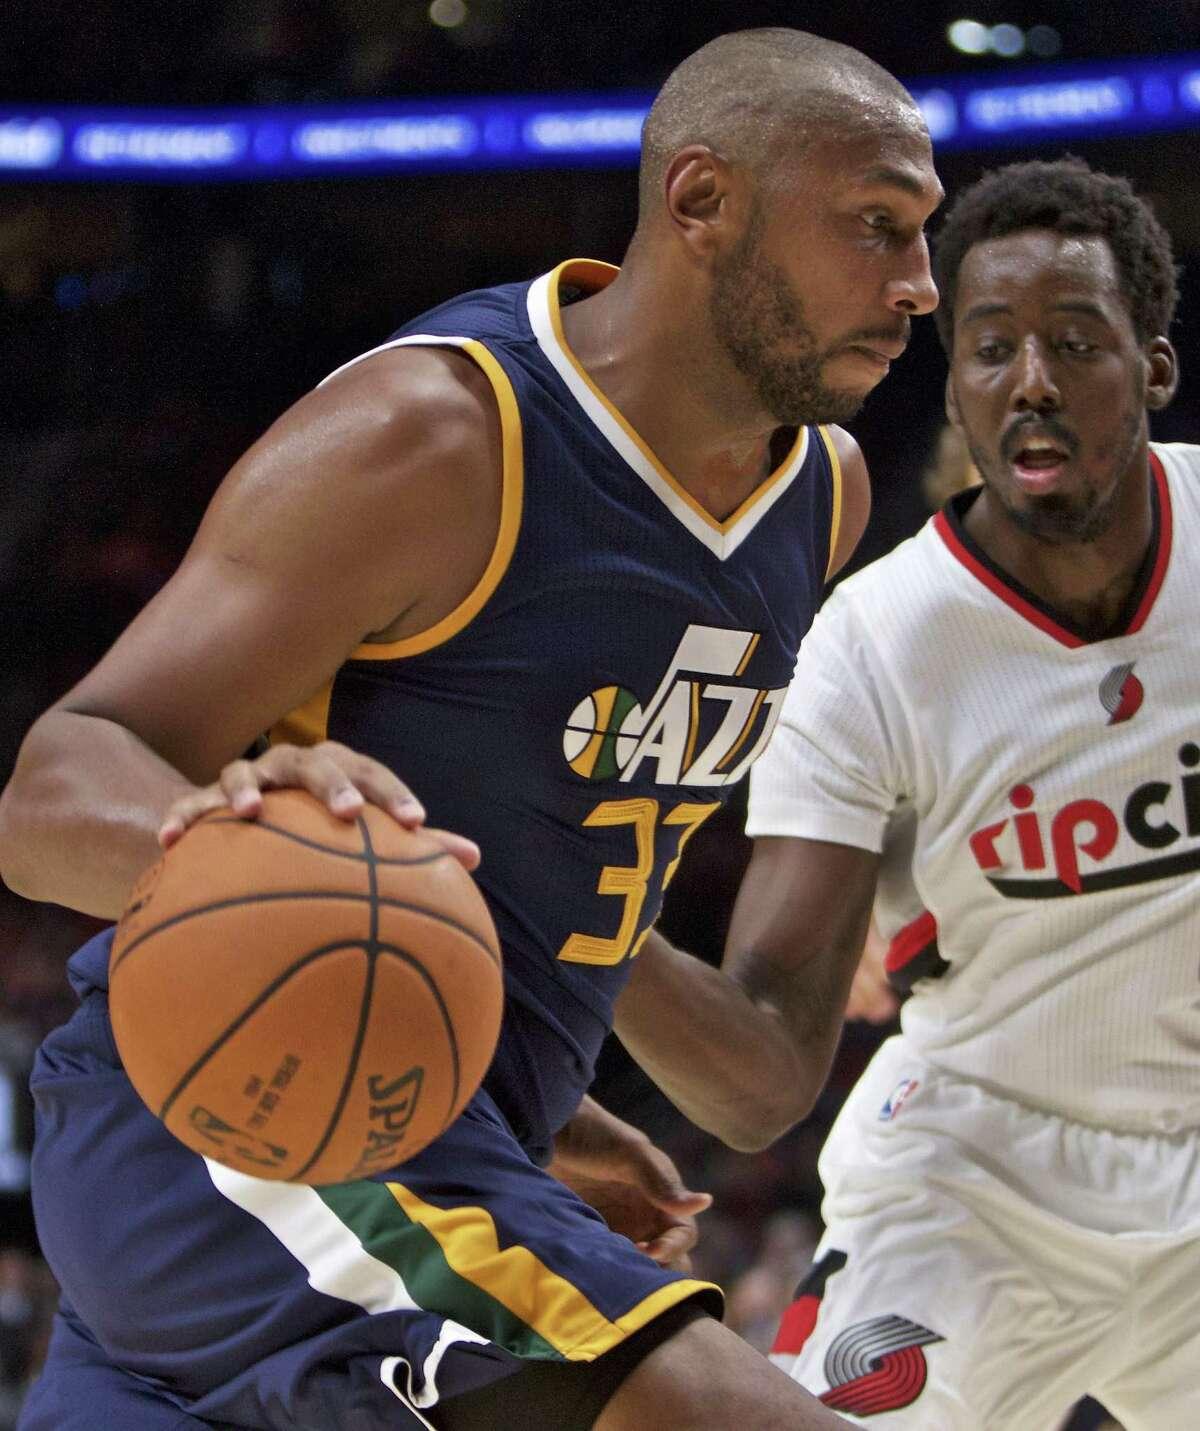 Utah Jazz center Boris Diaw dribbles around Portland Trail Blazers forward Al-Farouq Aminu in the second half on Oct. 25, 2016.